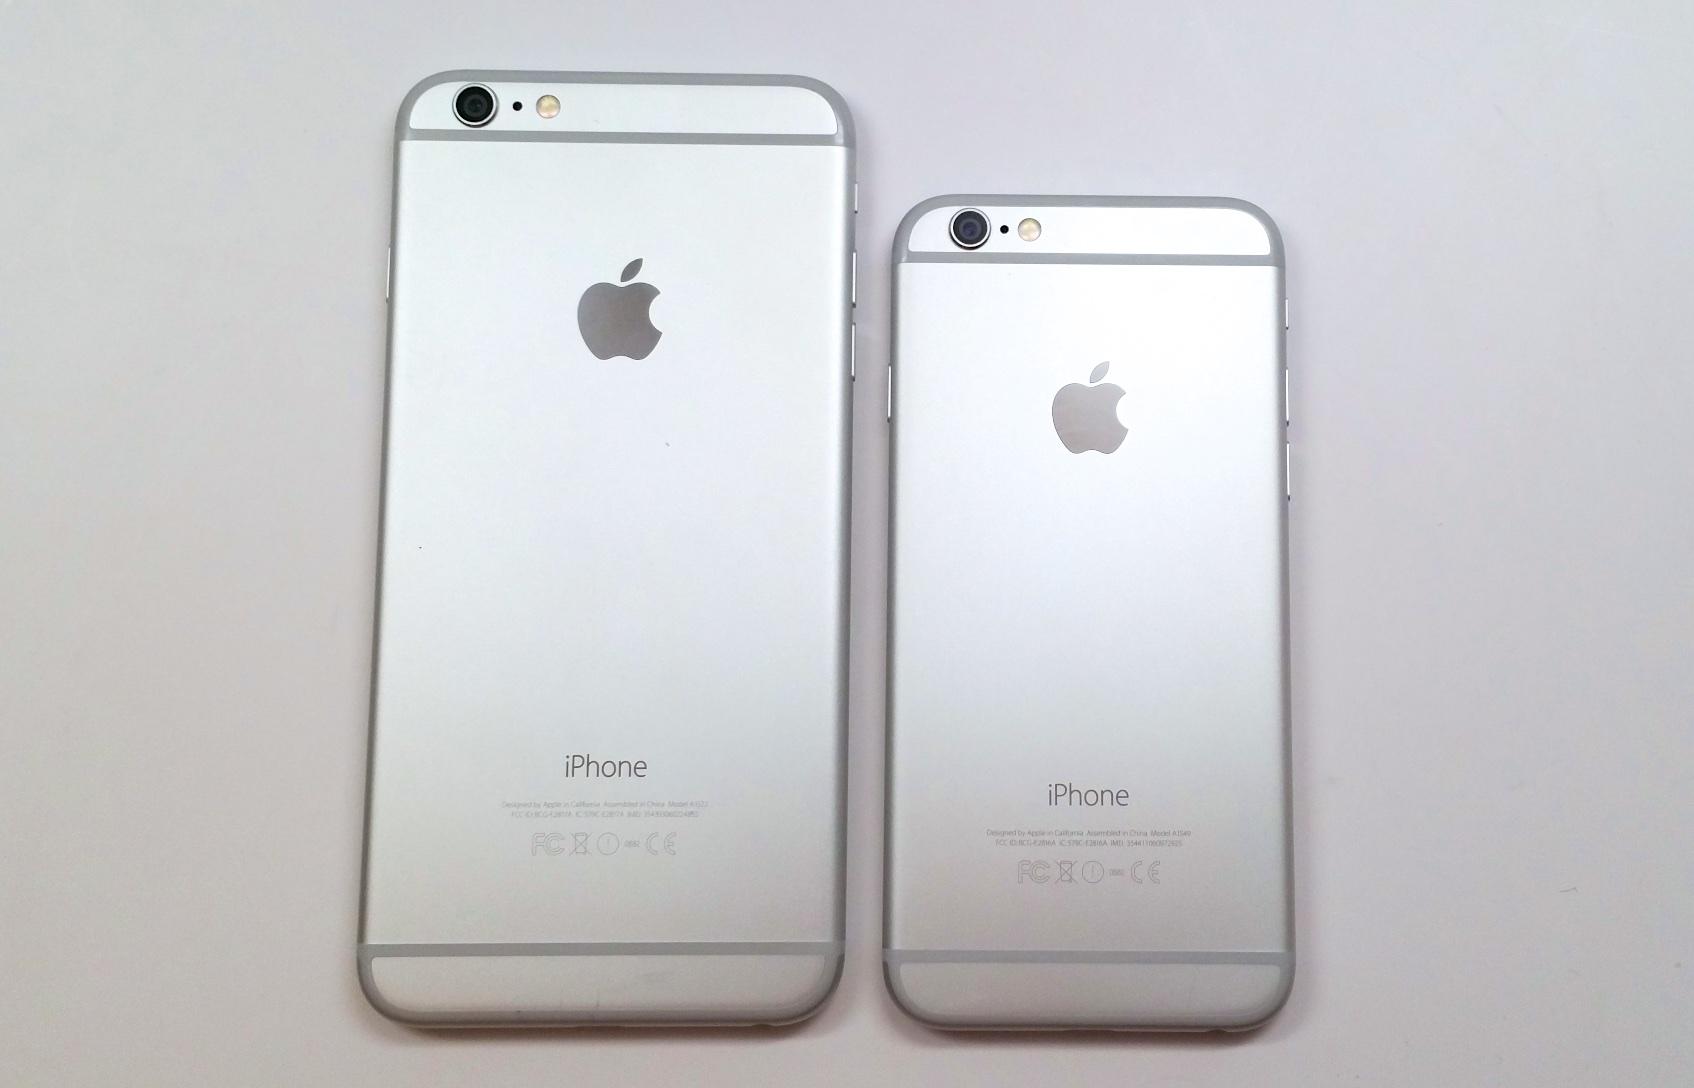 63 Best iPhone 6 Apps